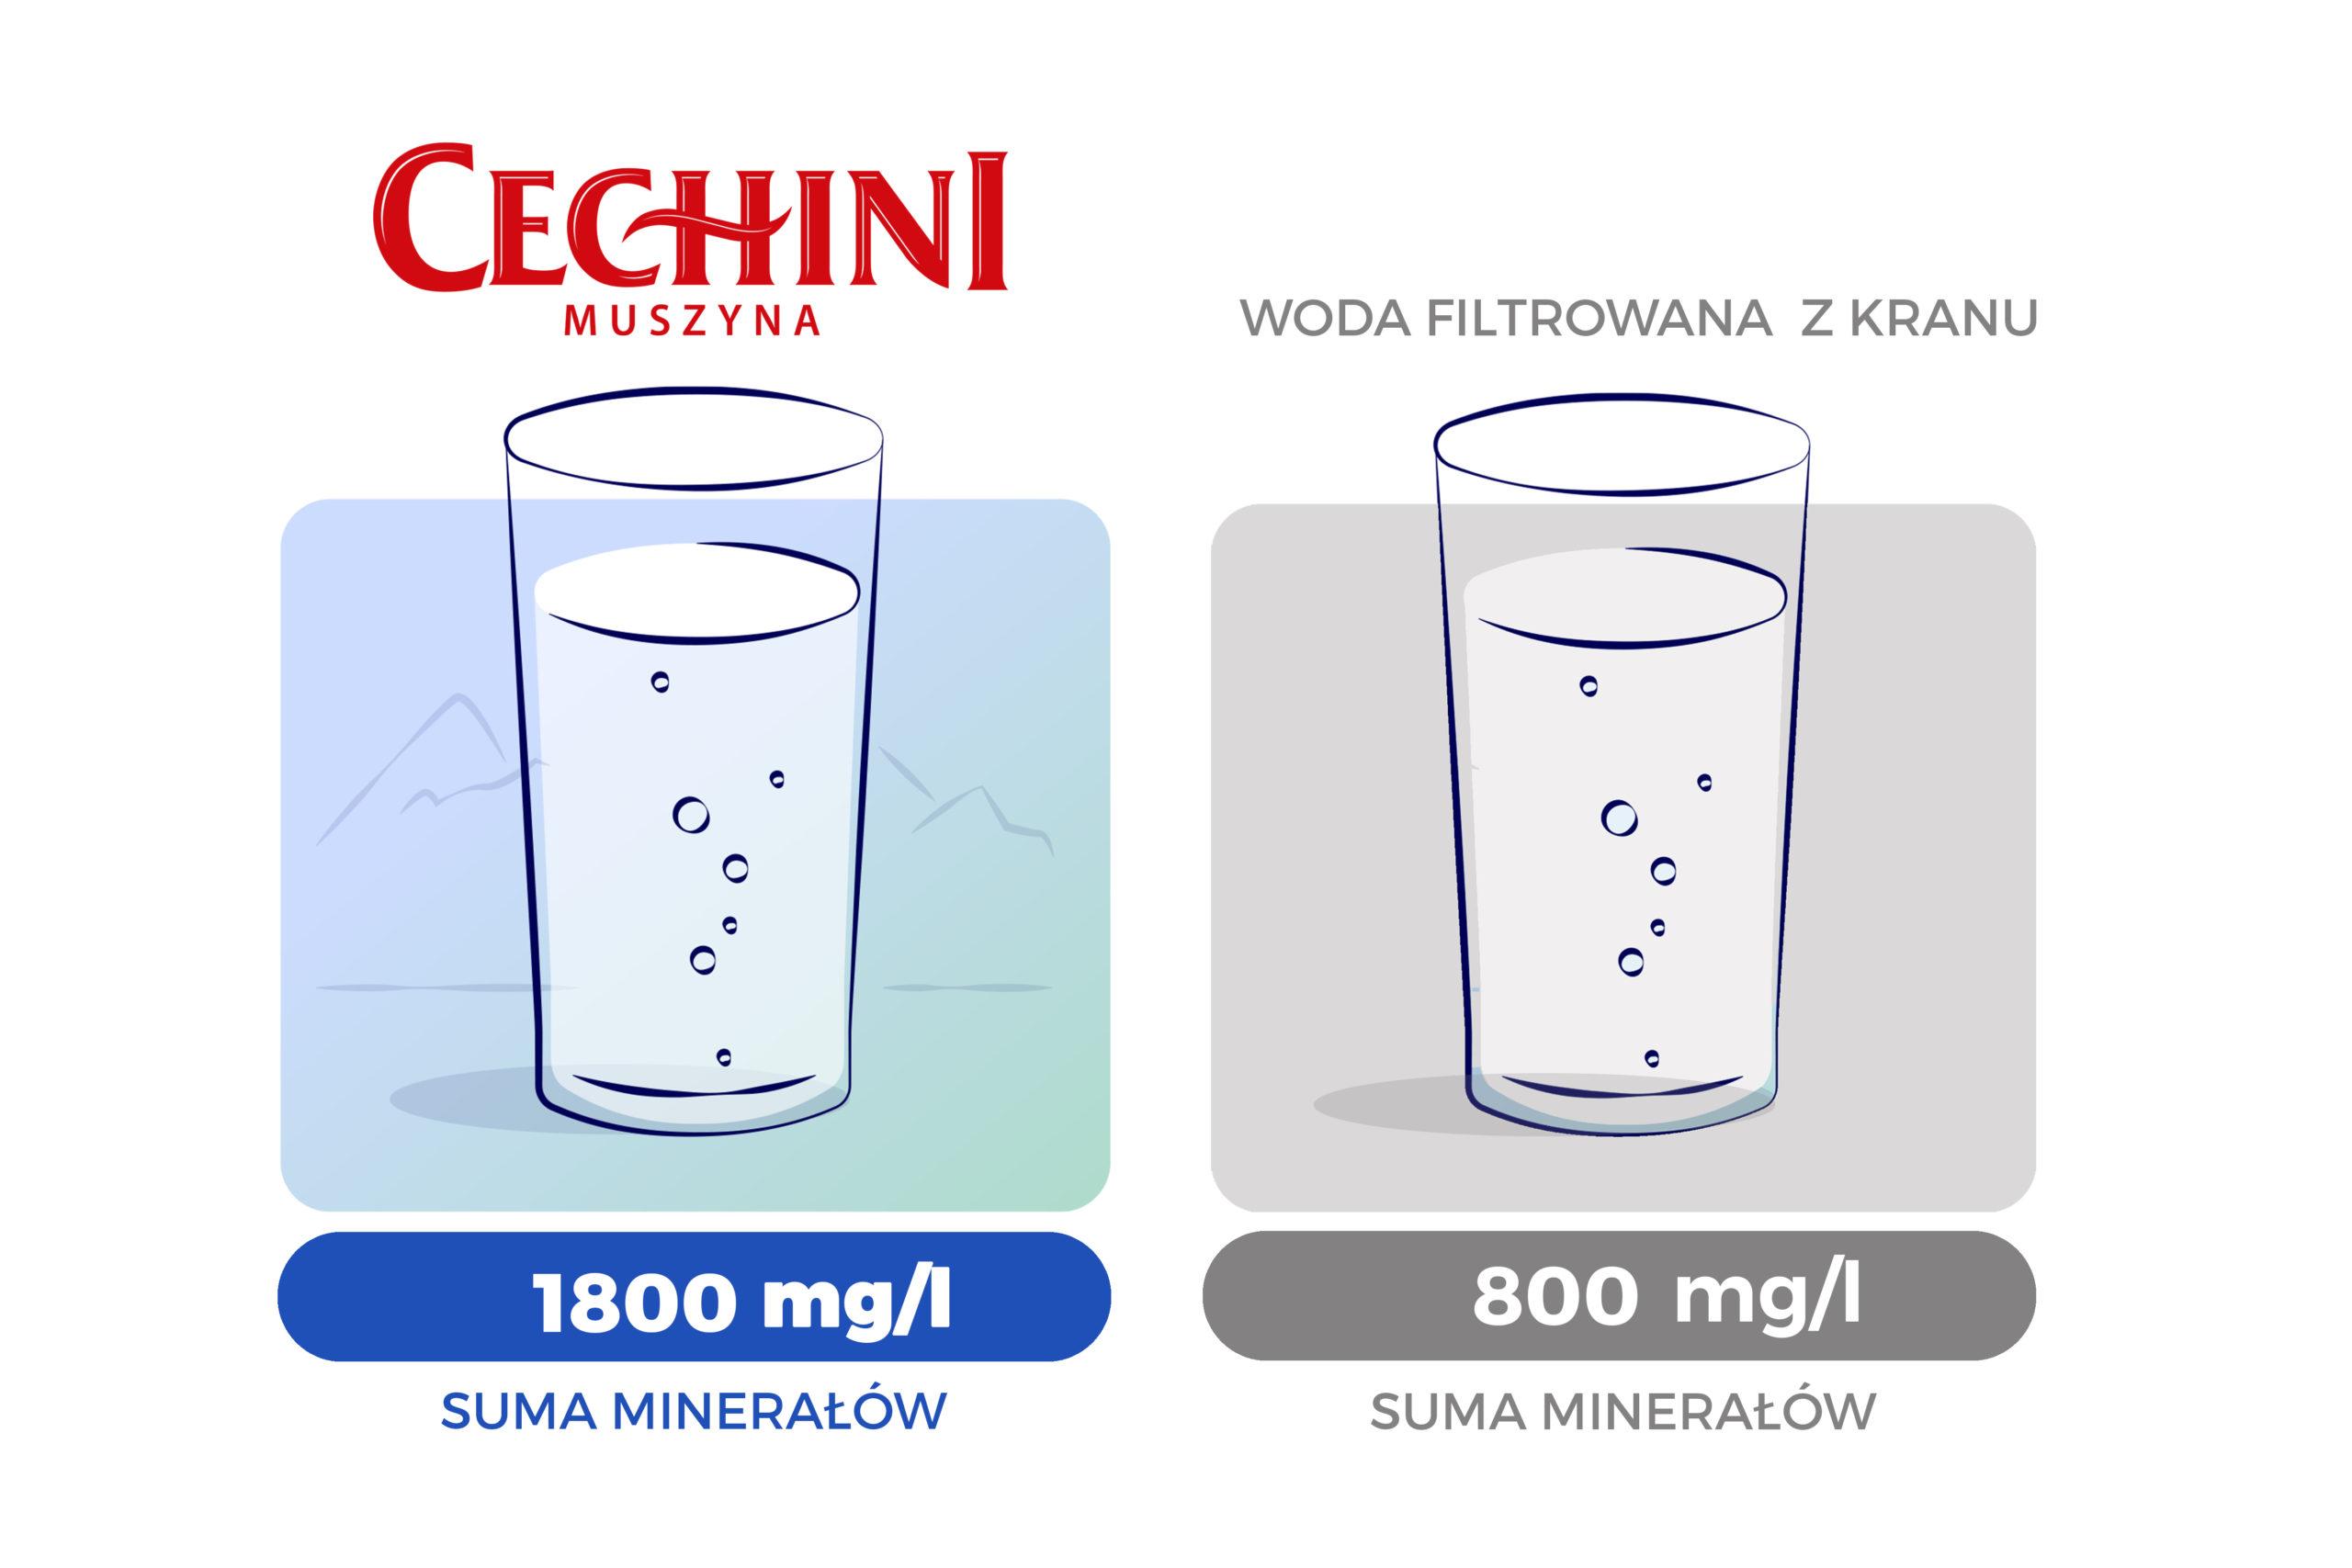 woda filtrowana vs woda Cechini